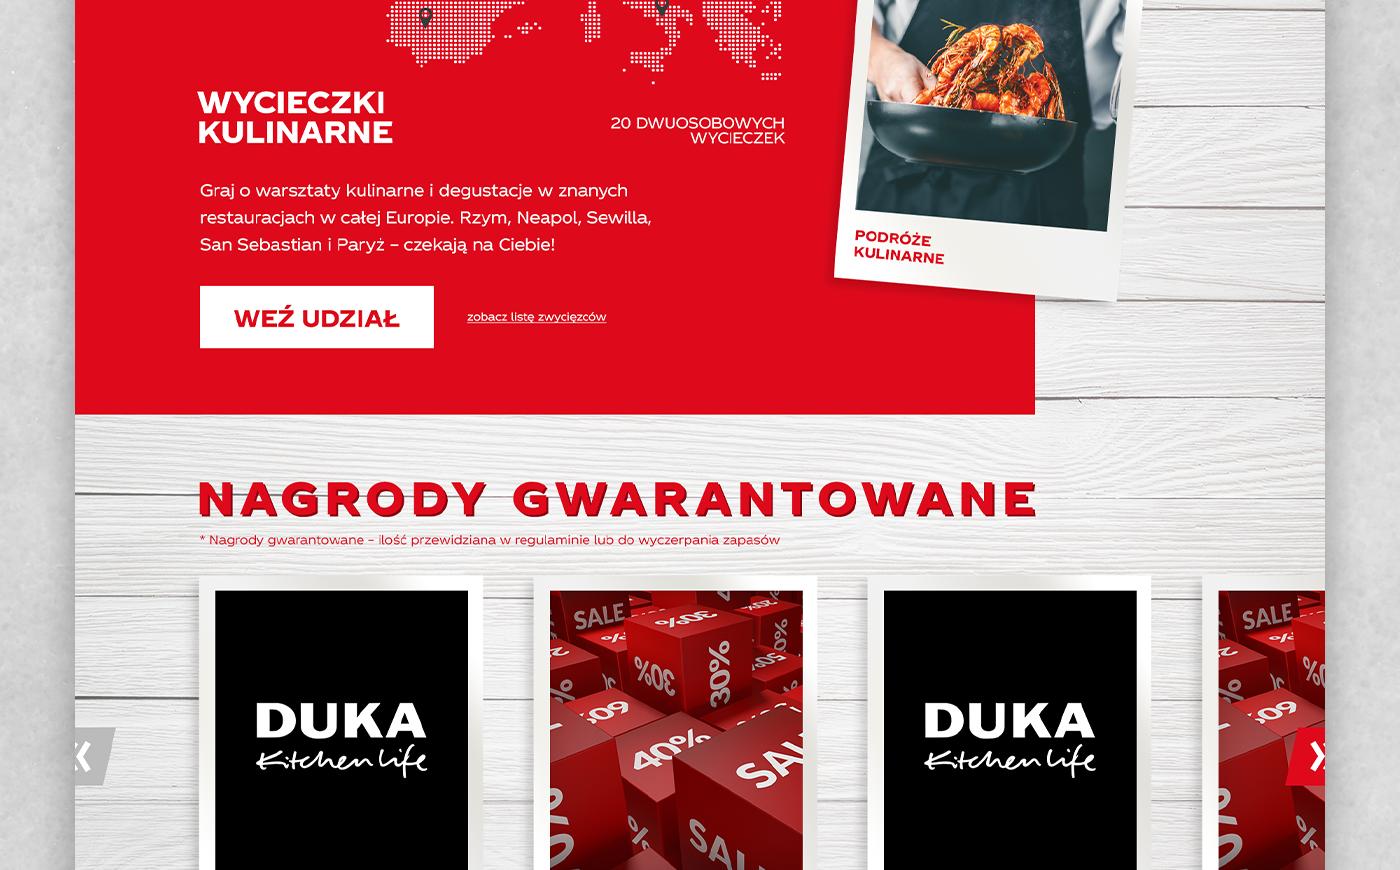 Coca-Cola cocacola Website landingpage Lottery www